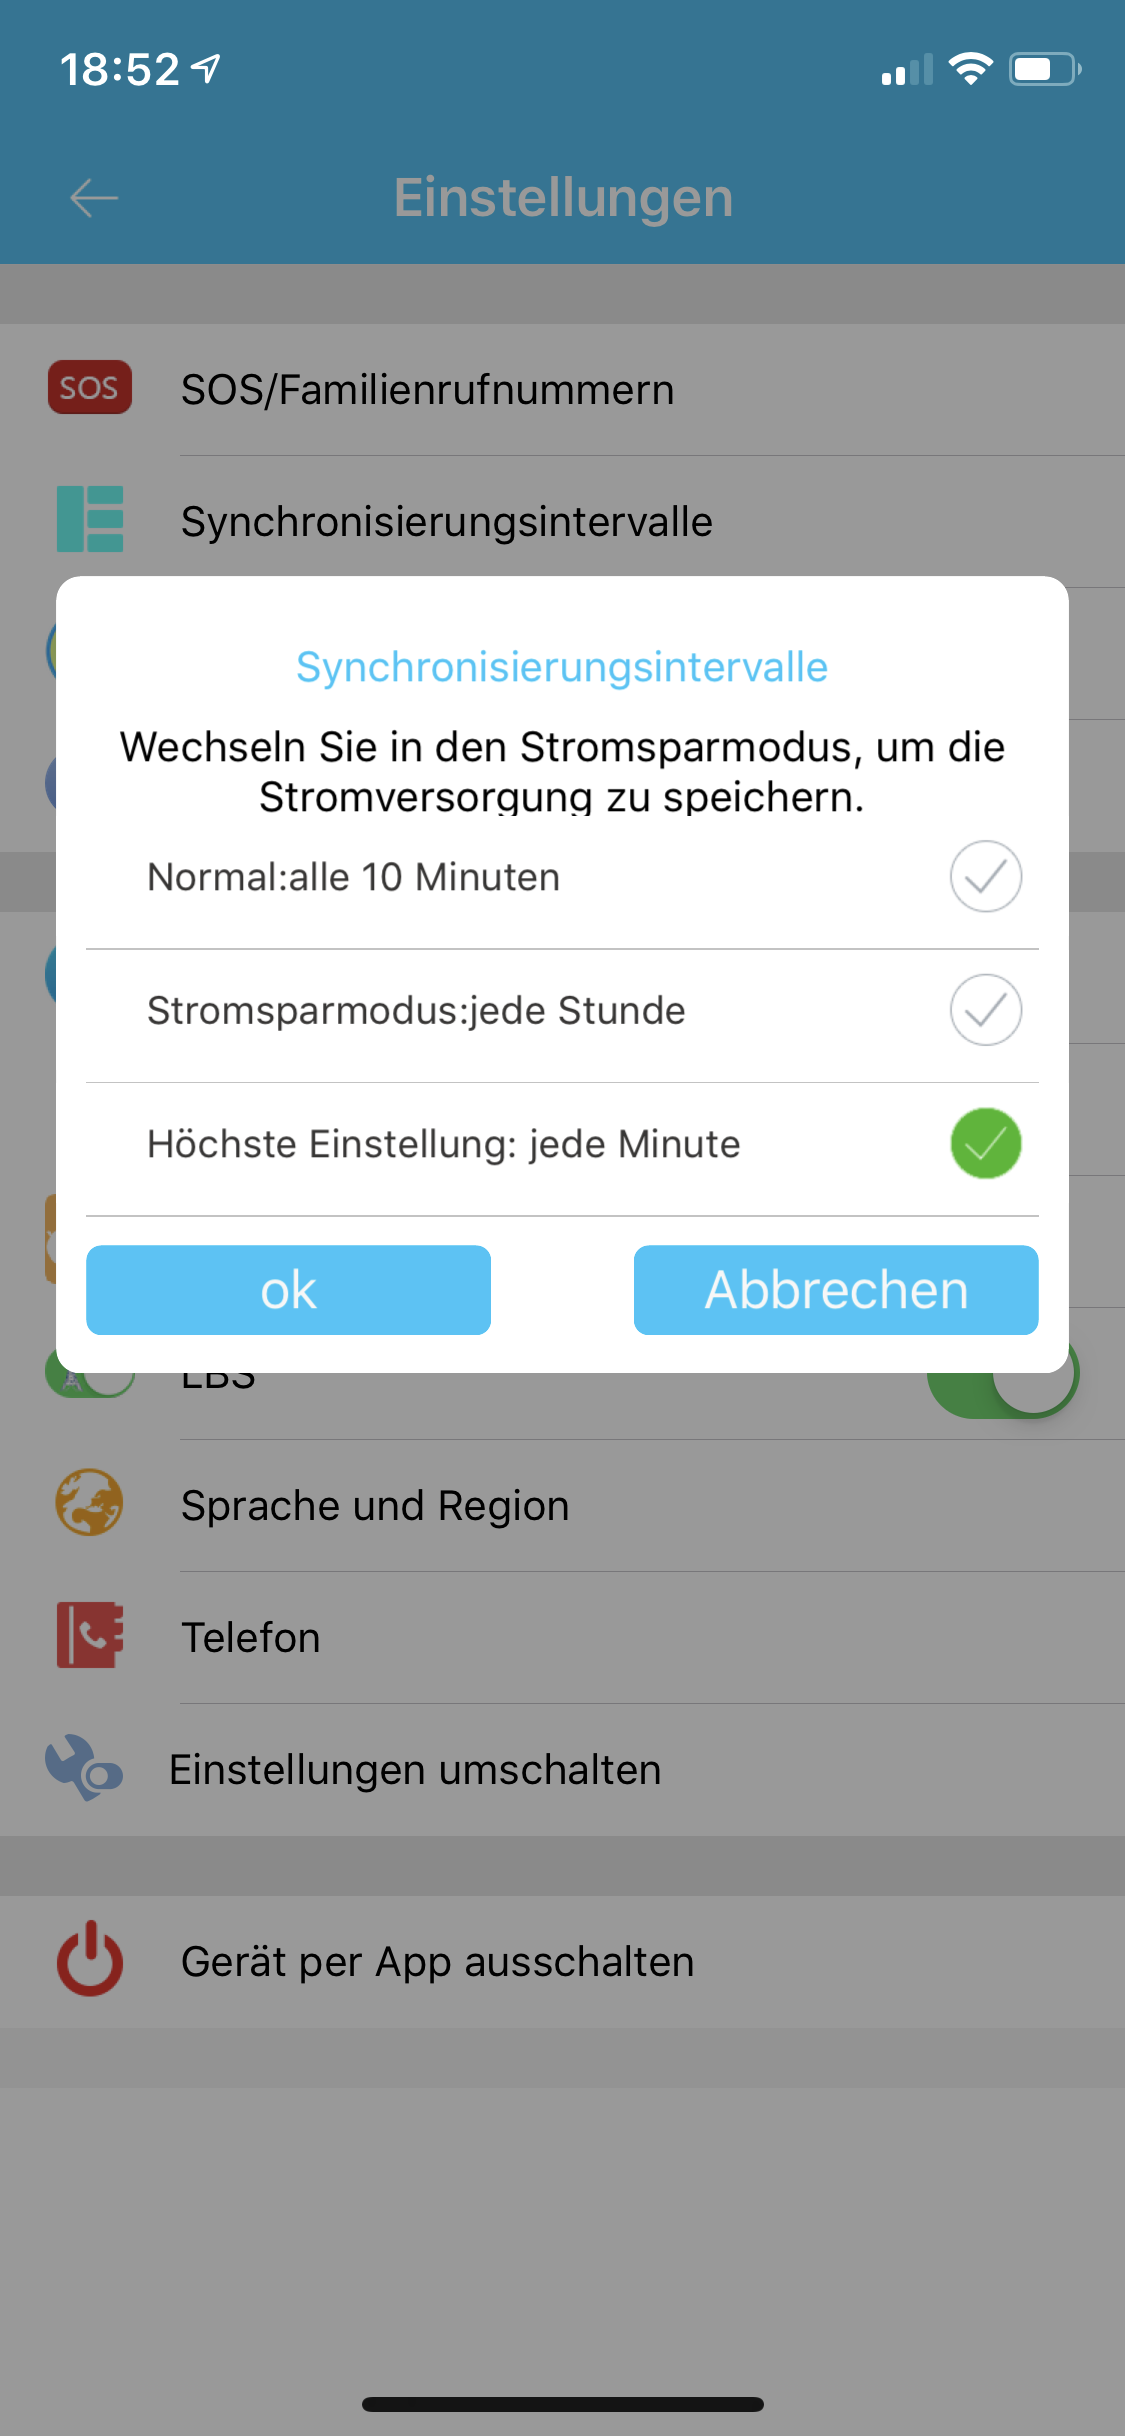 SE-Tracker-App Synchronisierungsintervalle